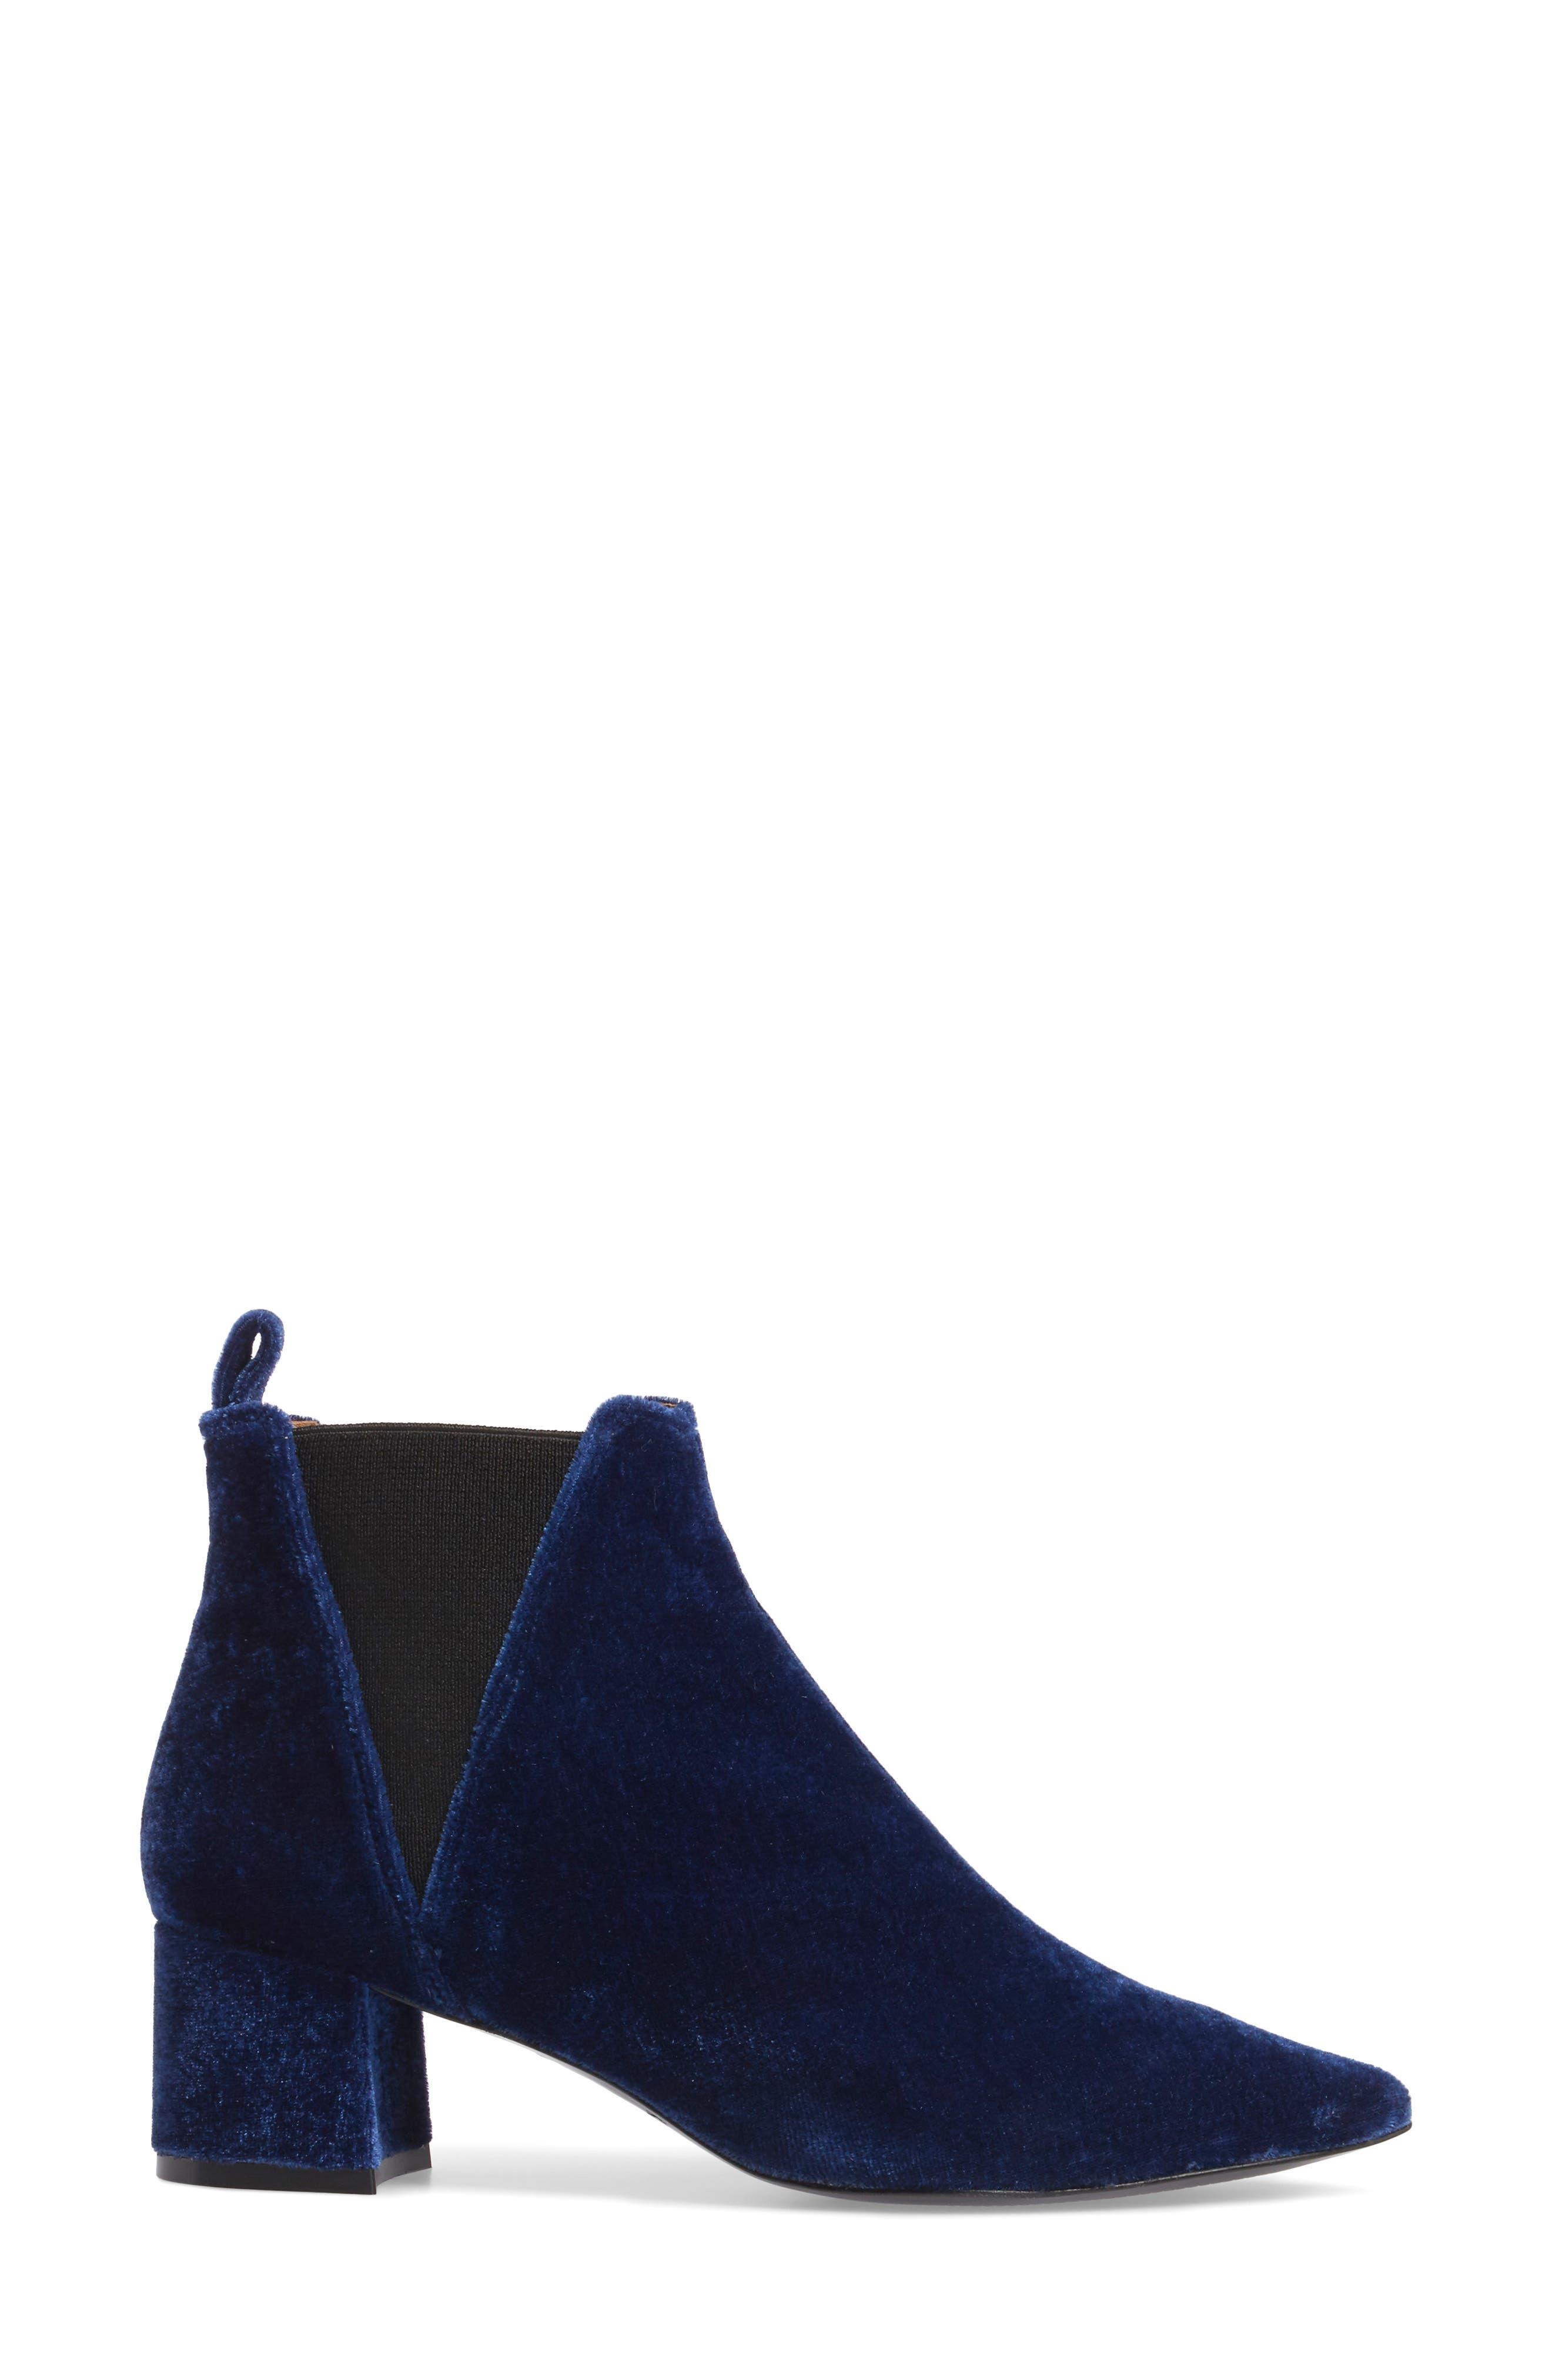 Renita Pointy Toe Chelsea Bootie,                             Alternate thumbnail 3, color,                             BLUE VELVET FABRIC